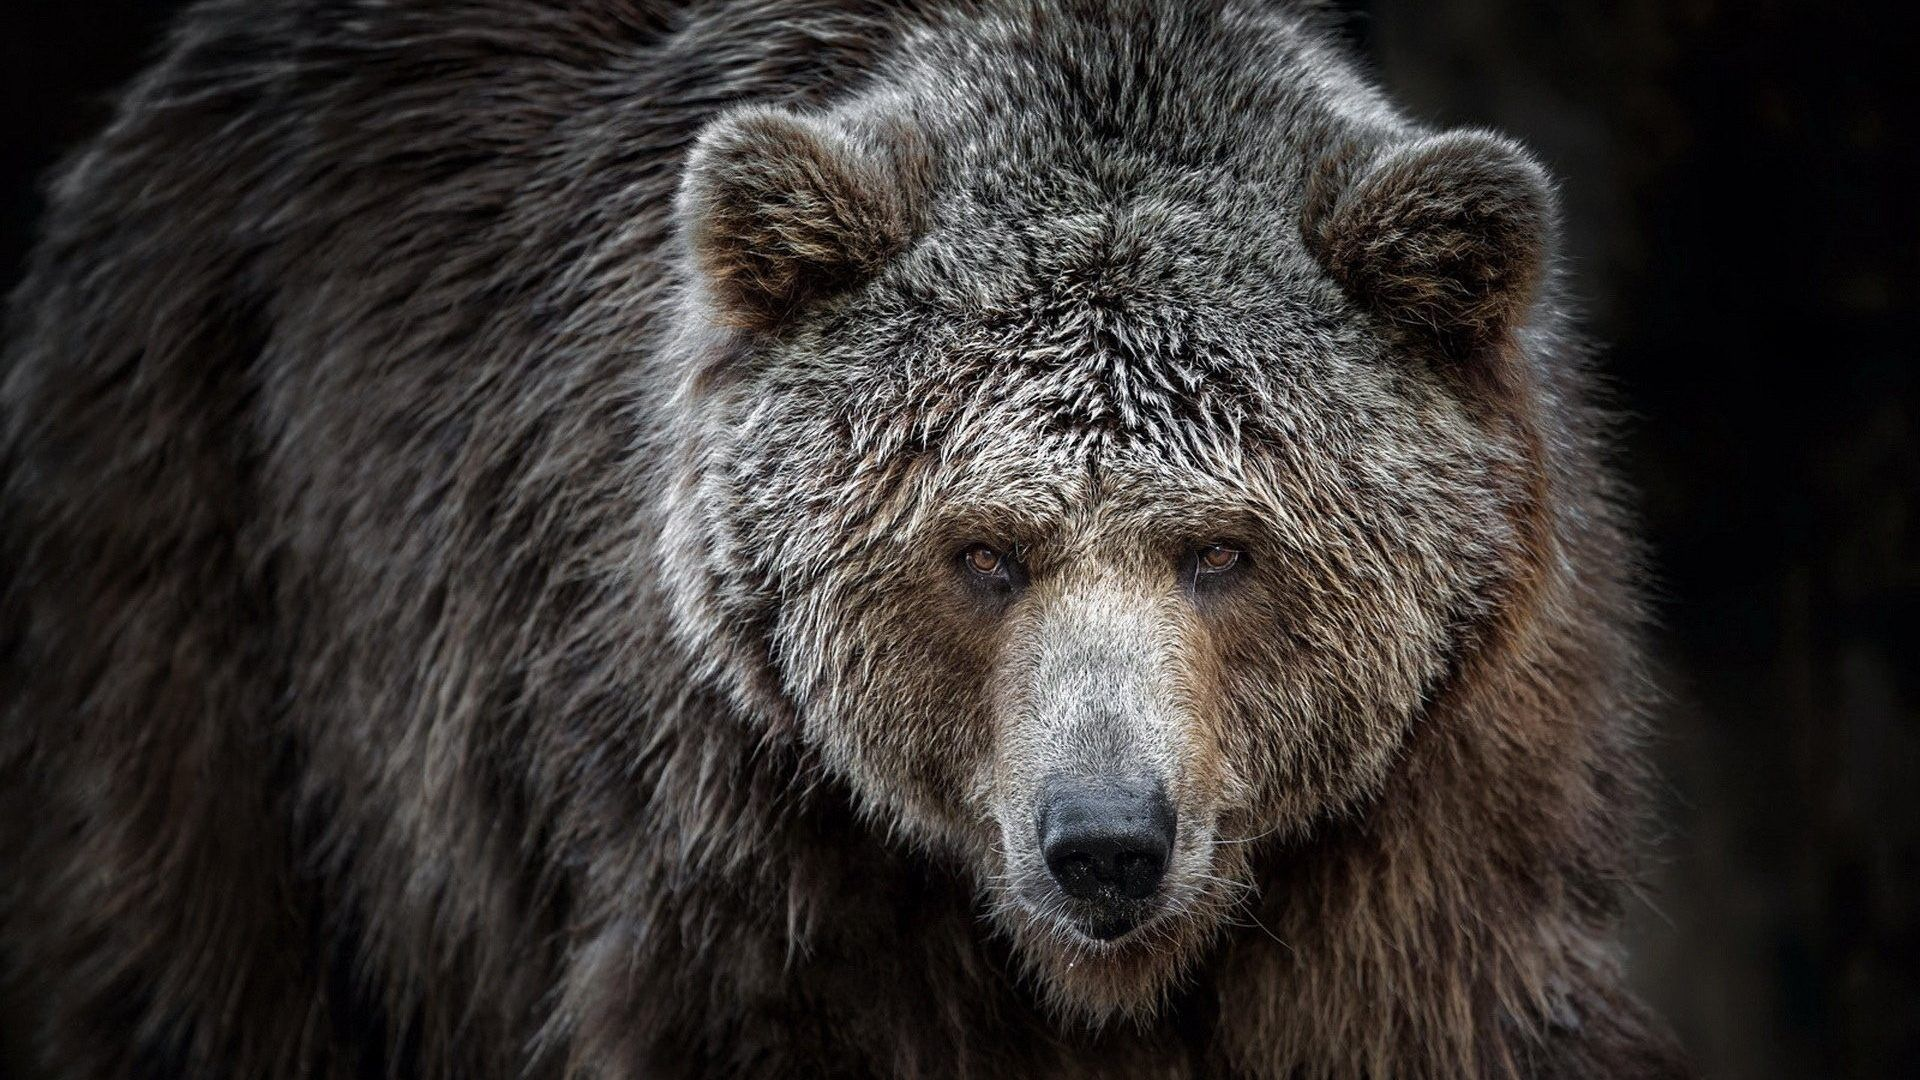 brown bear wallpaper